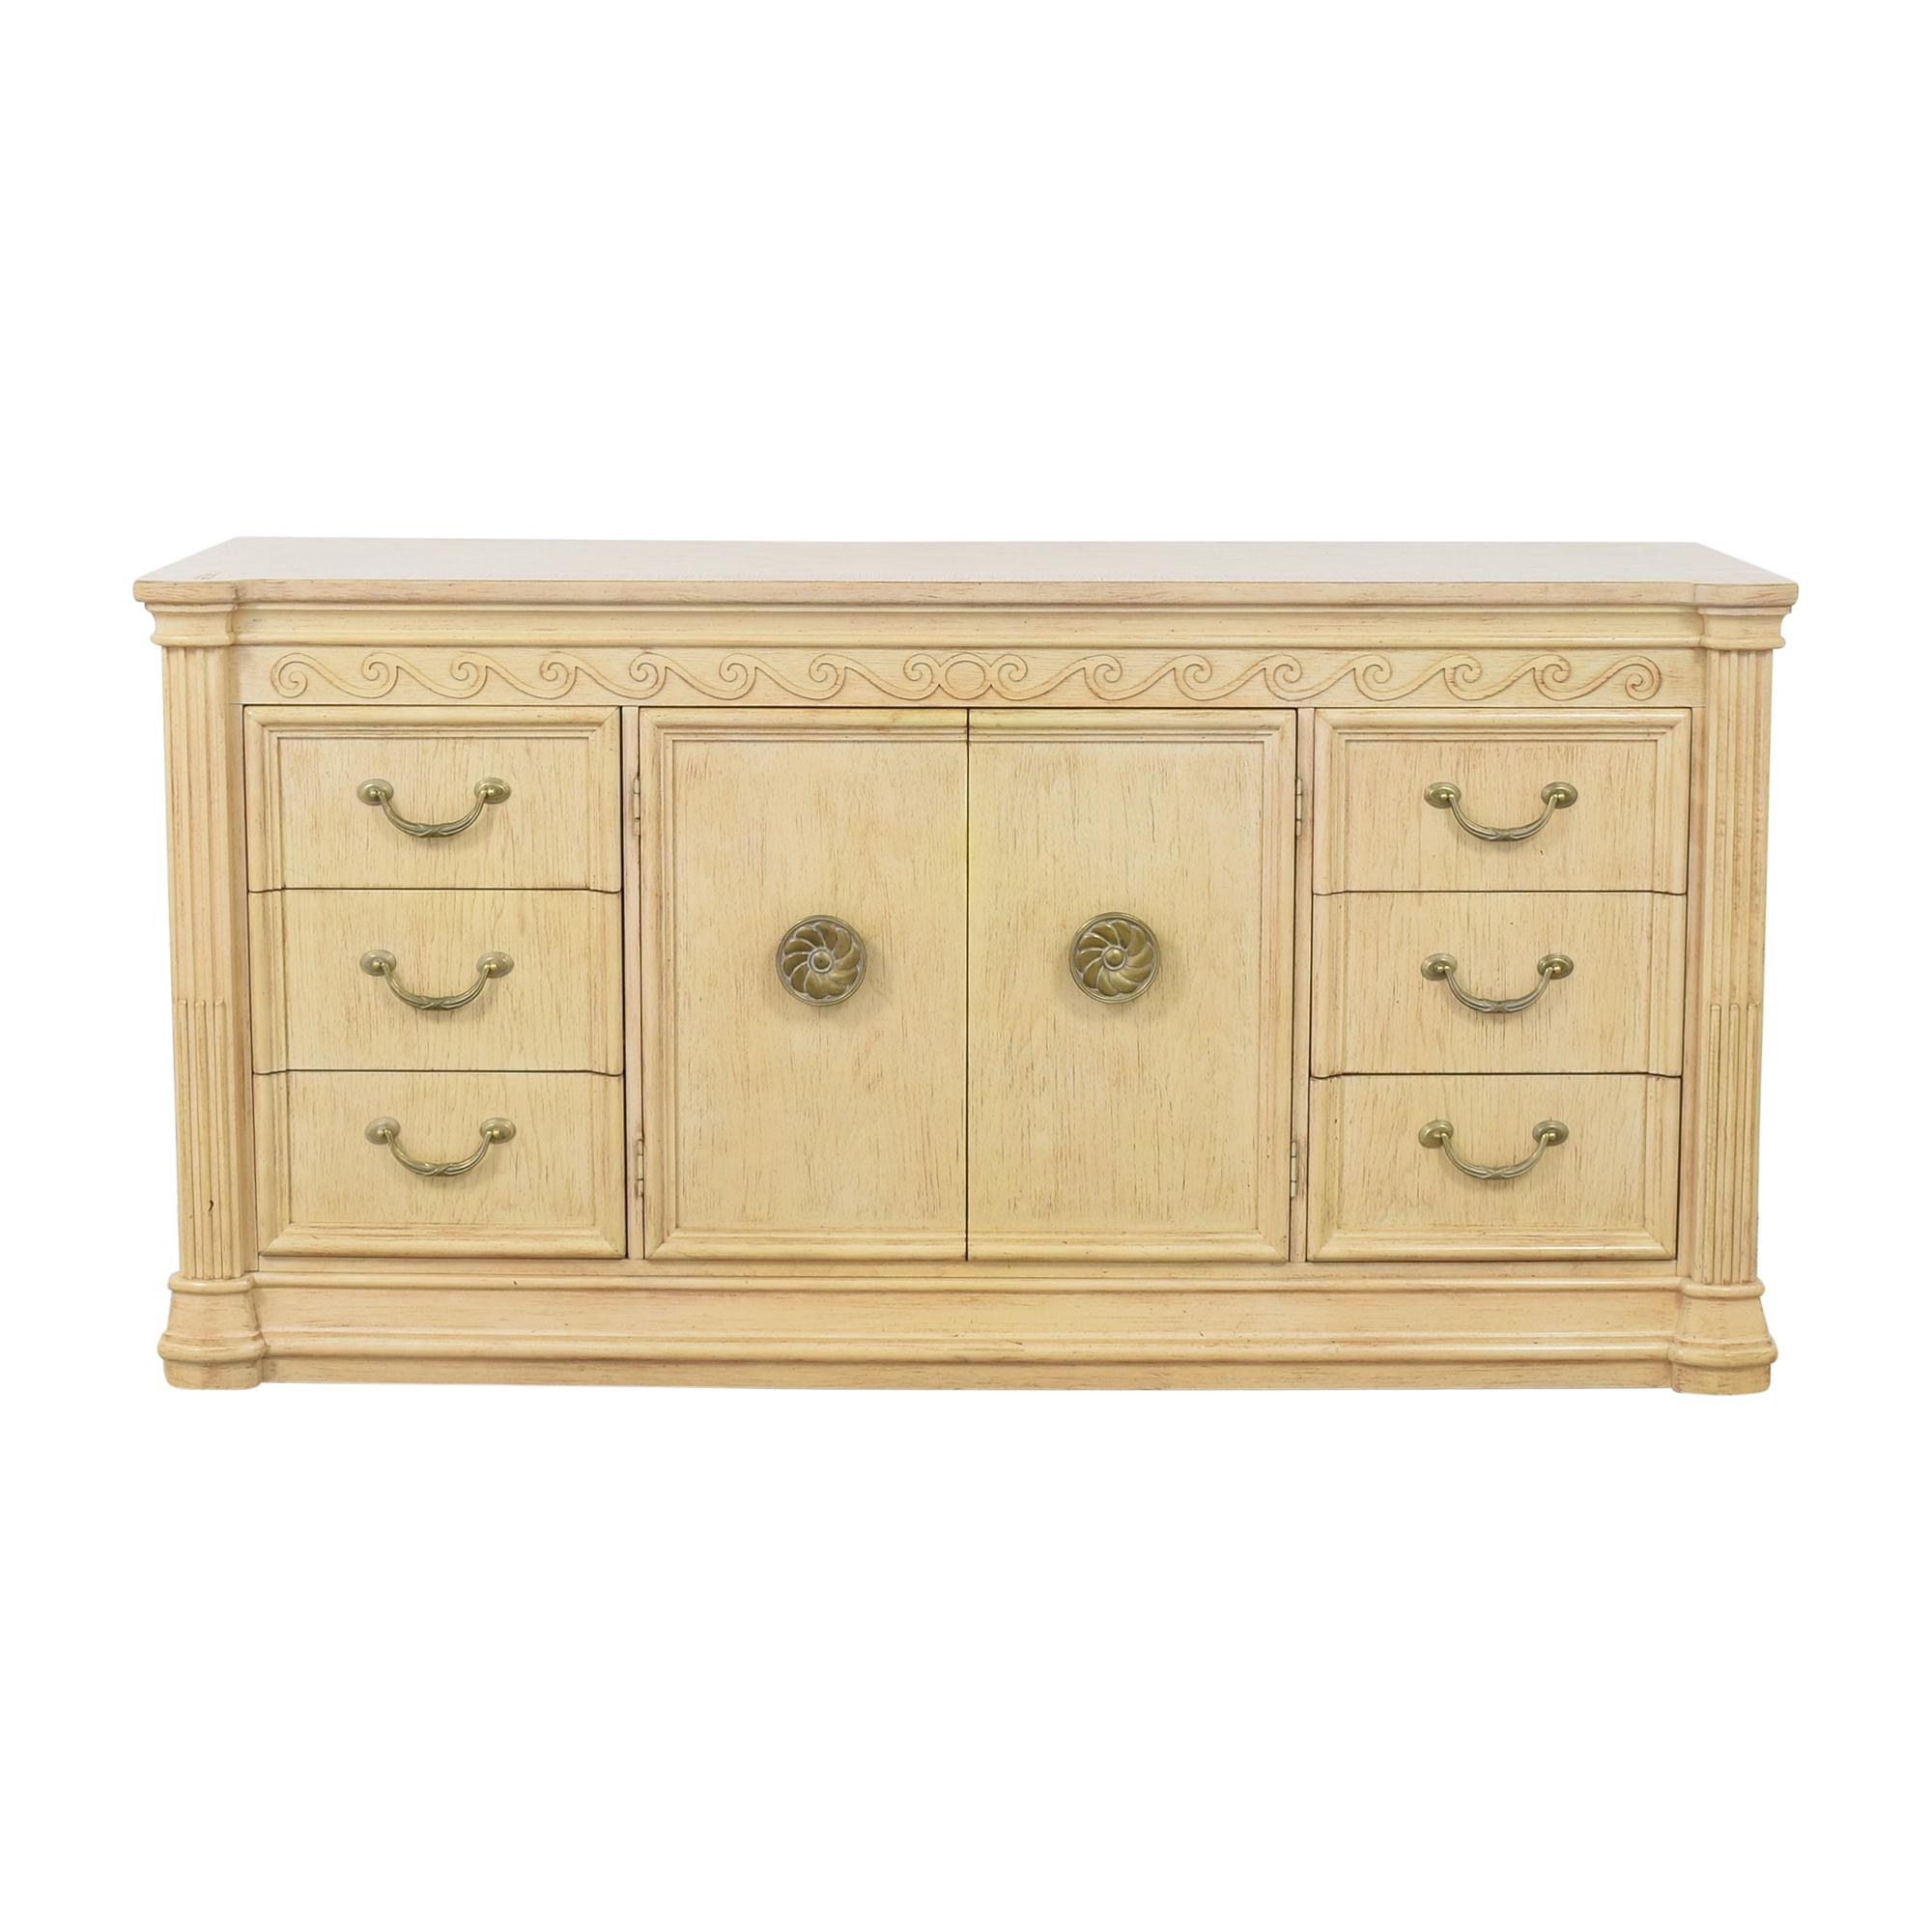 Bernhardt Bernhardt Triple Dresser with Cabinet coupon